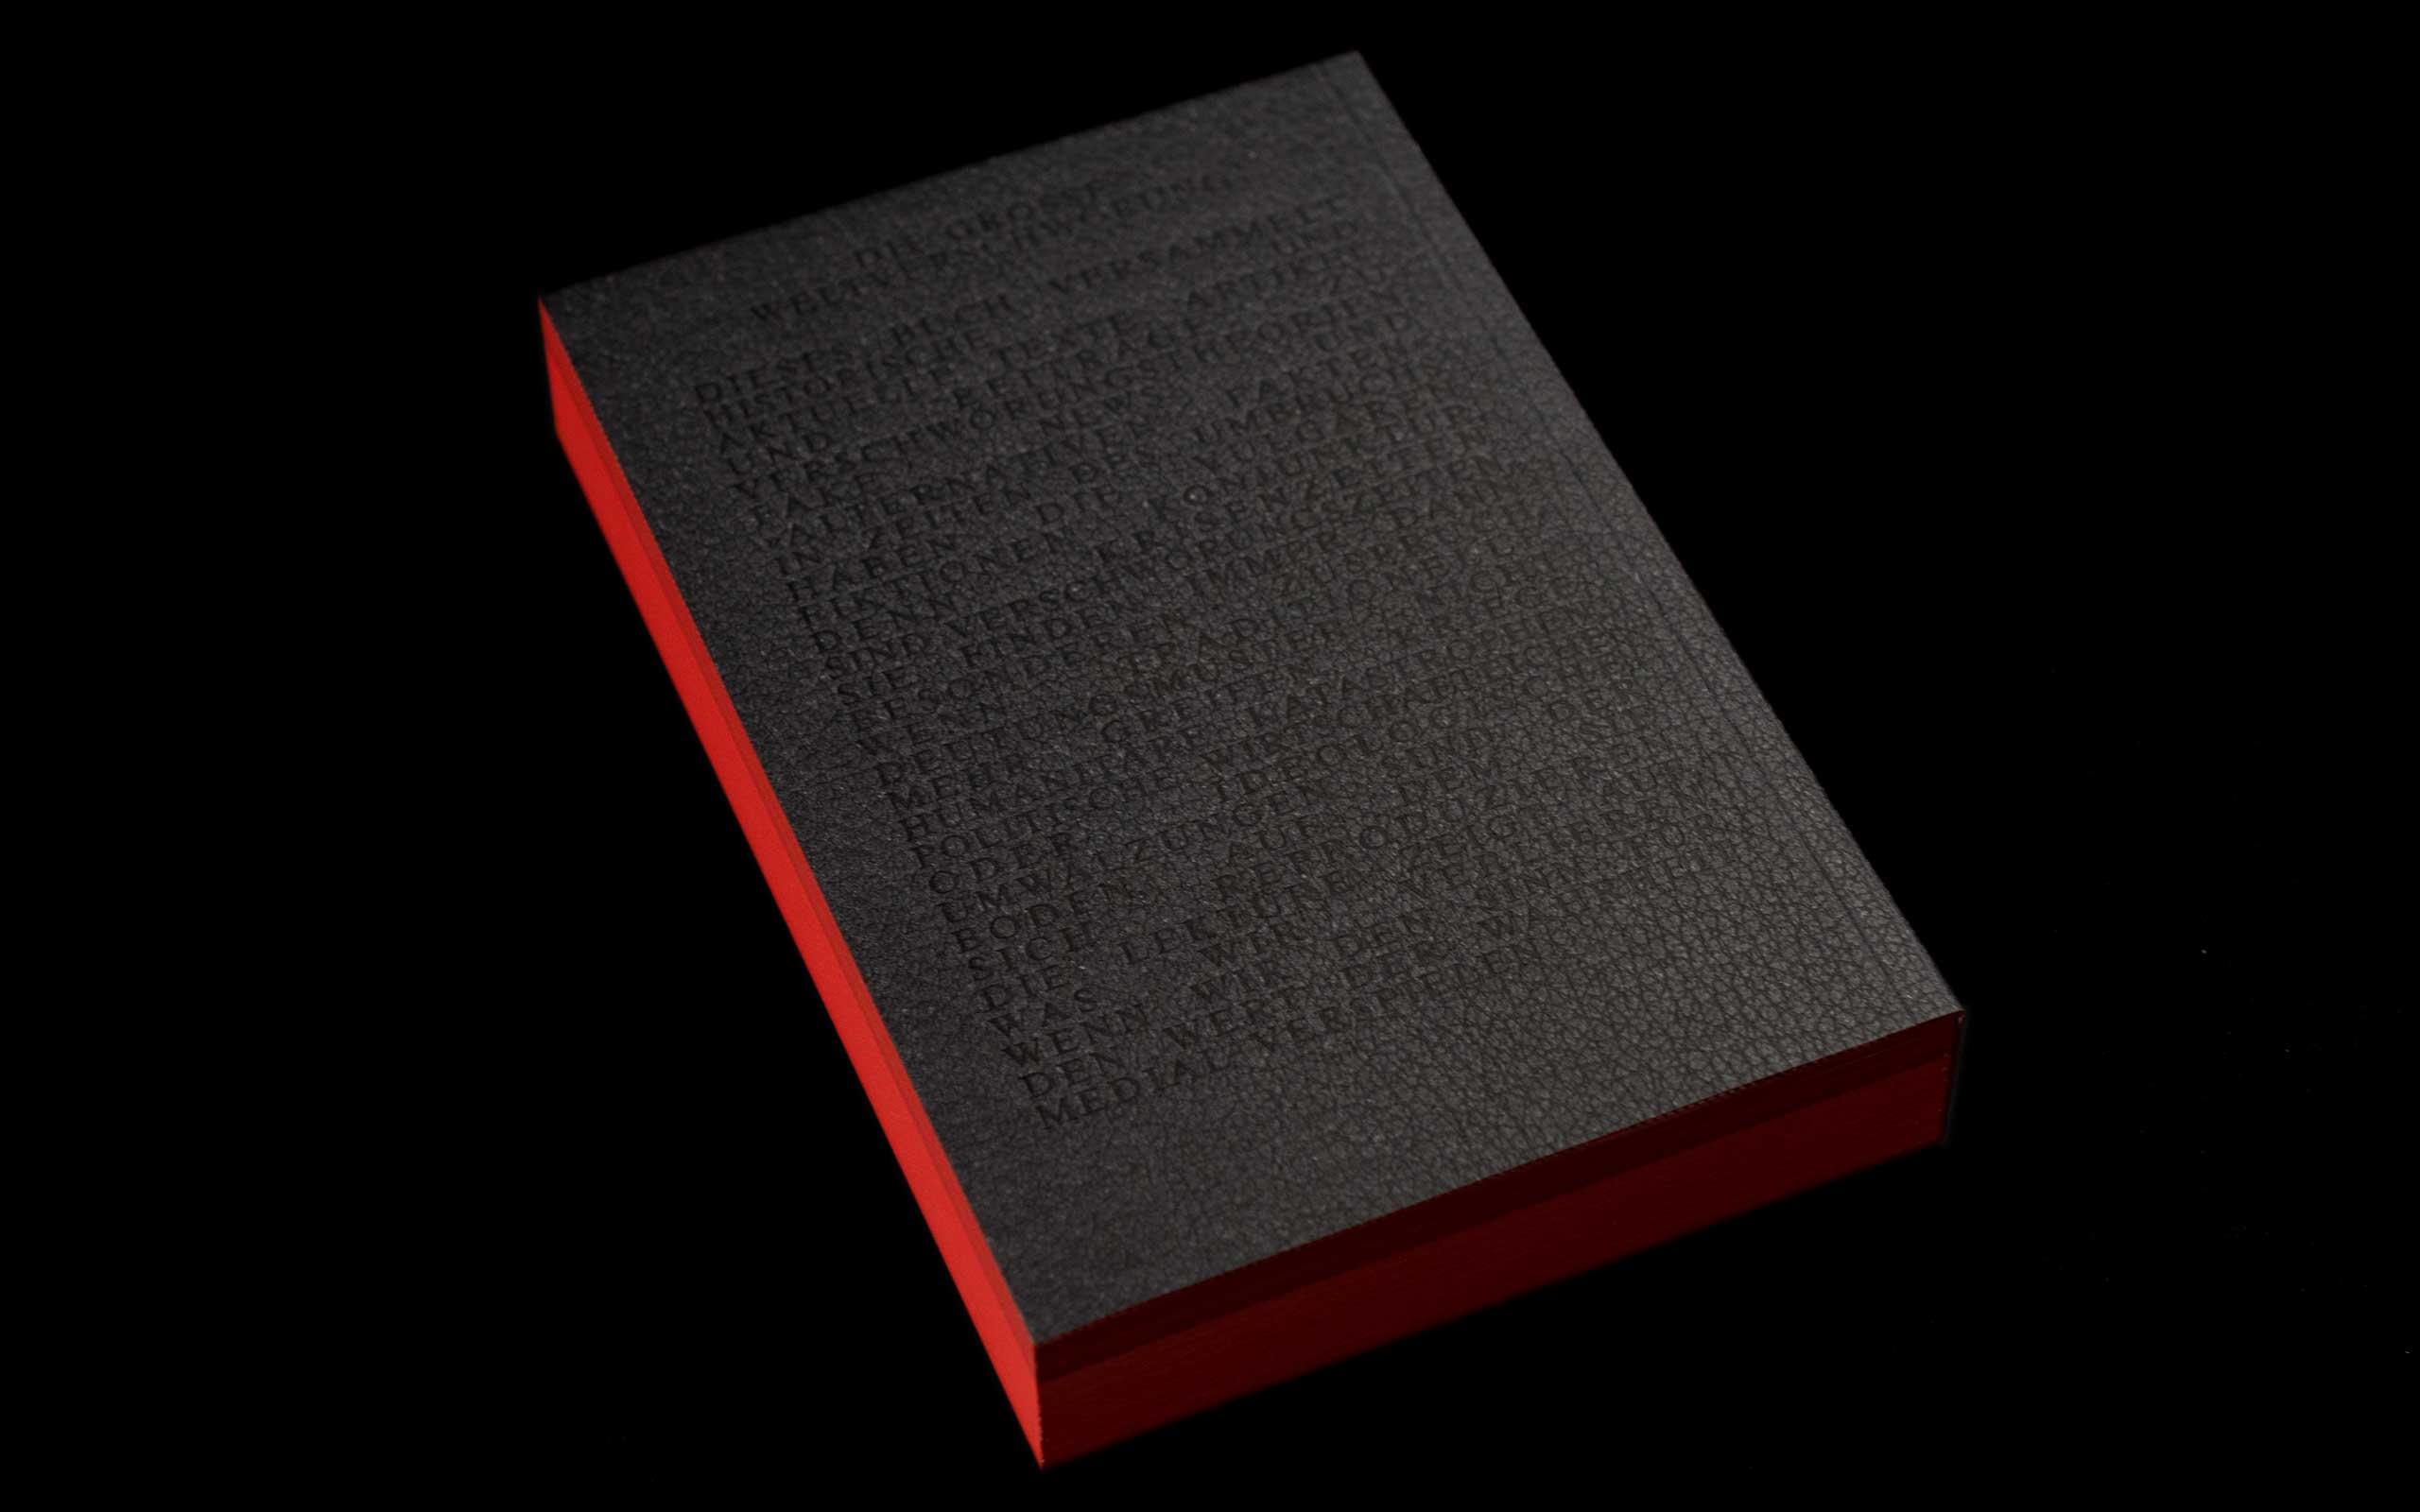 IZFDZ_Buch-backcover